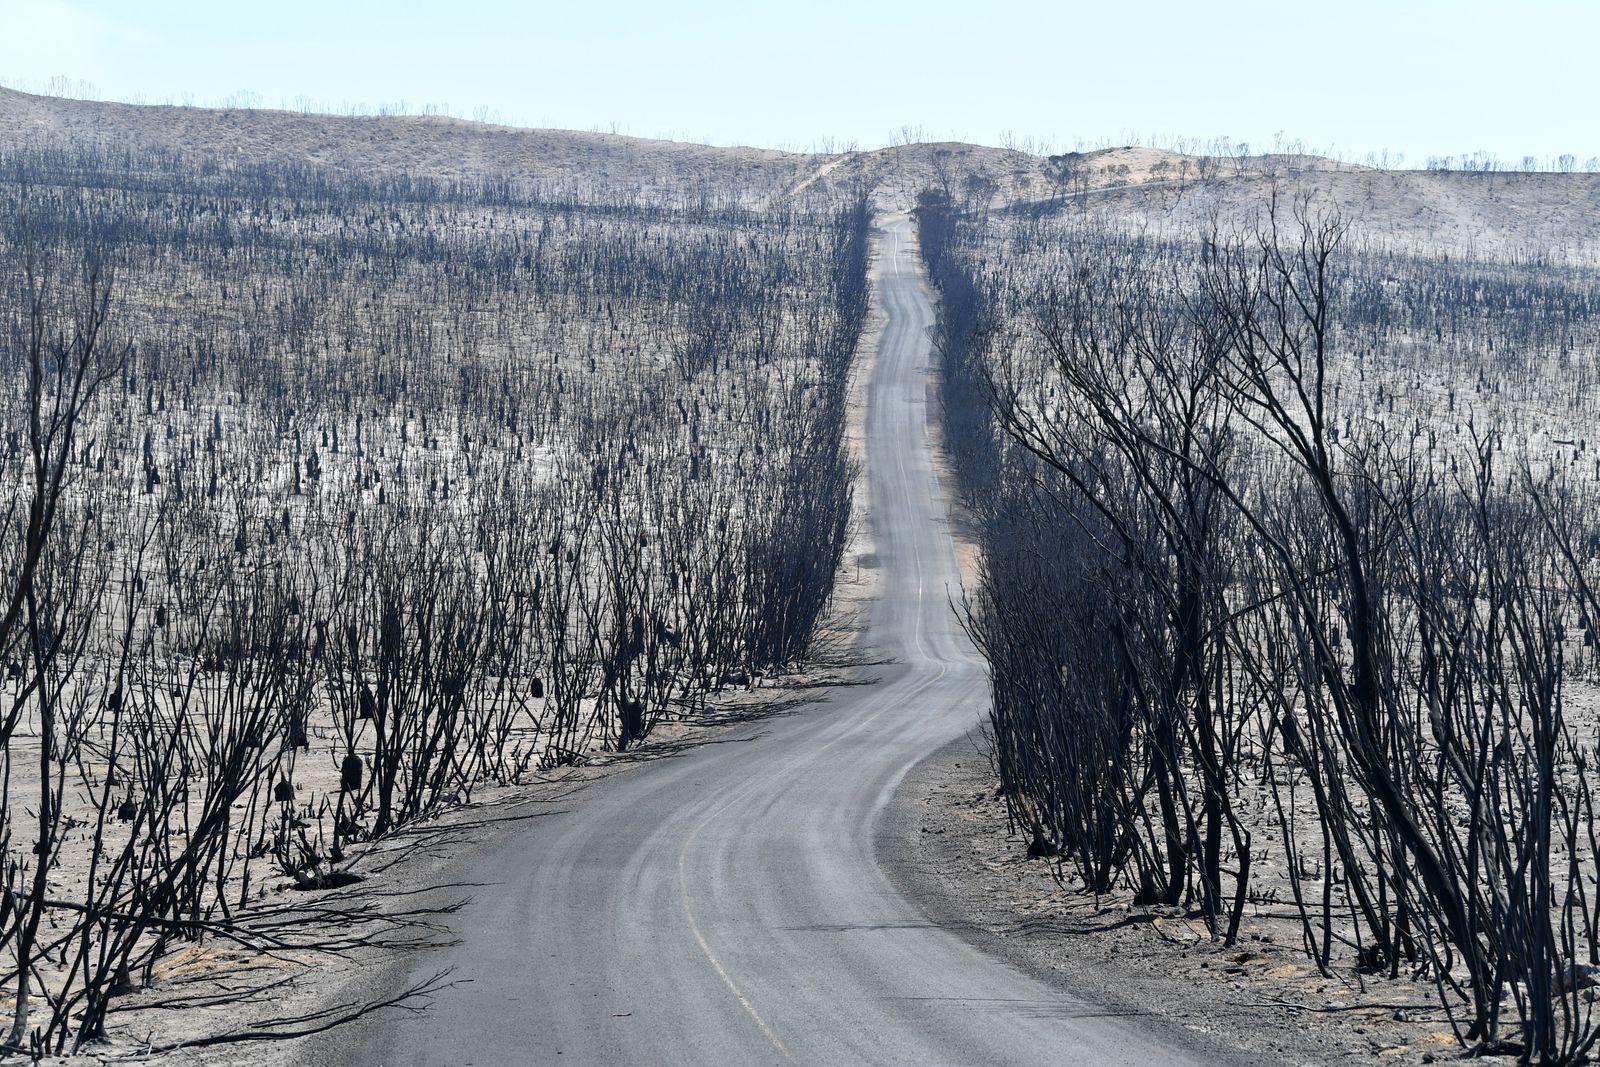 Bushfires in Australia, Kangaroo Island - 07 Jan 2020